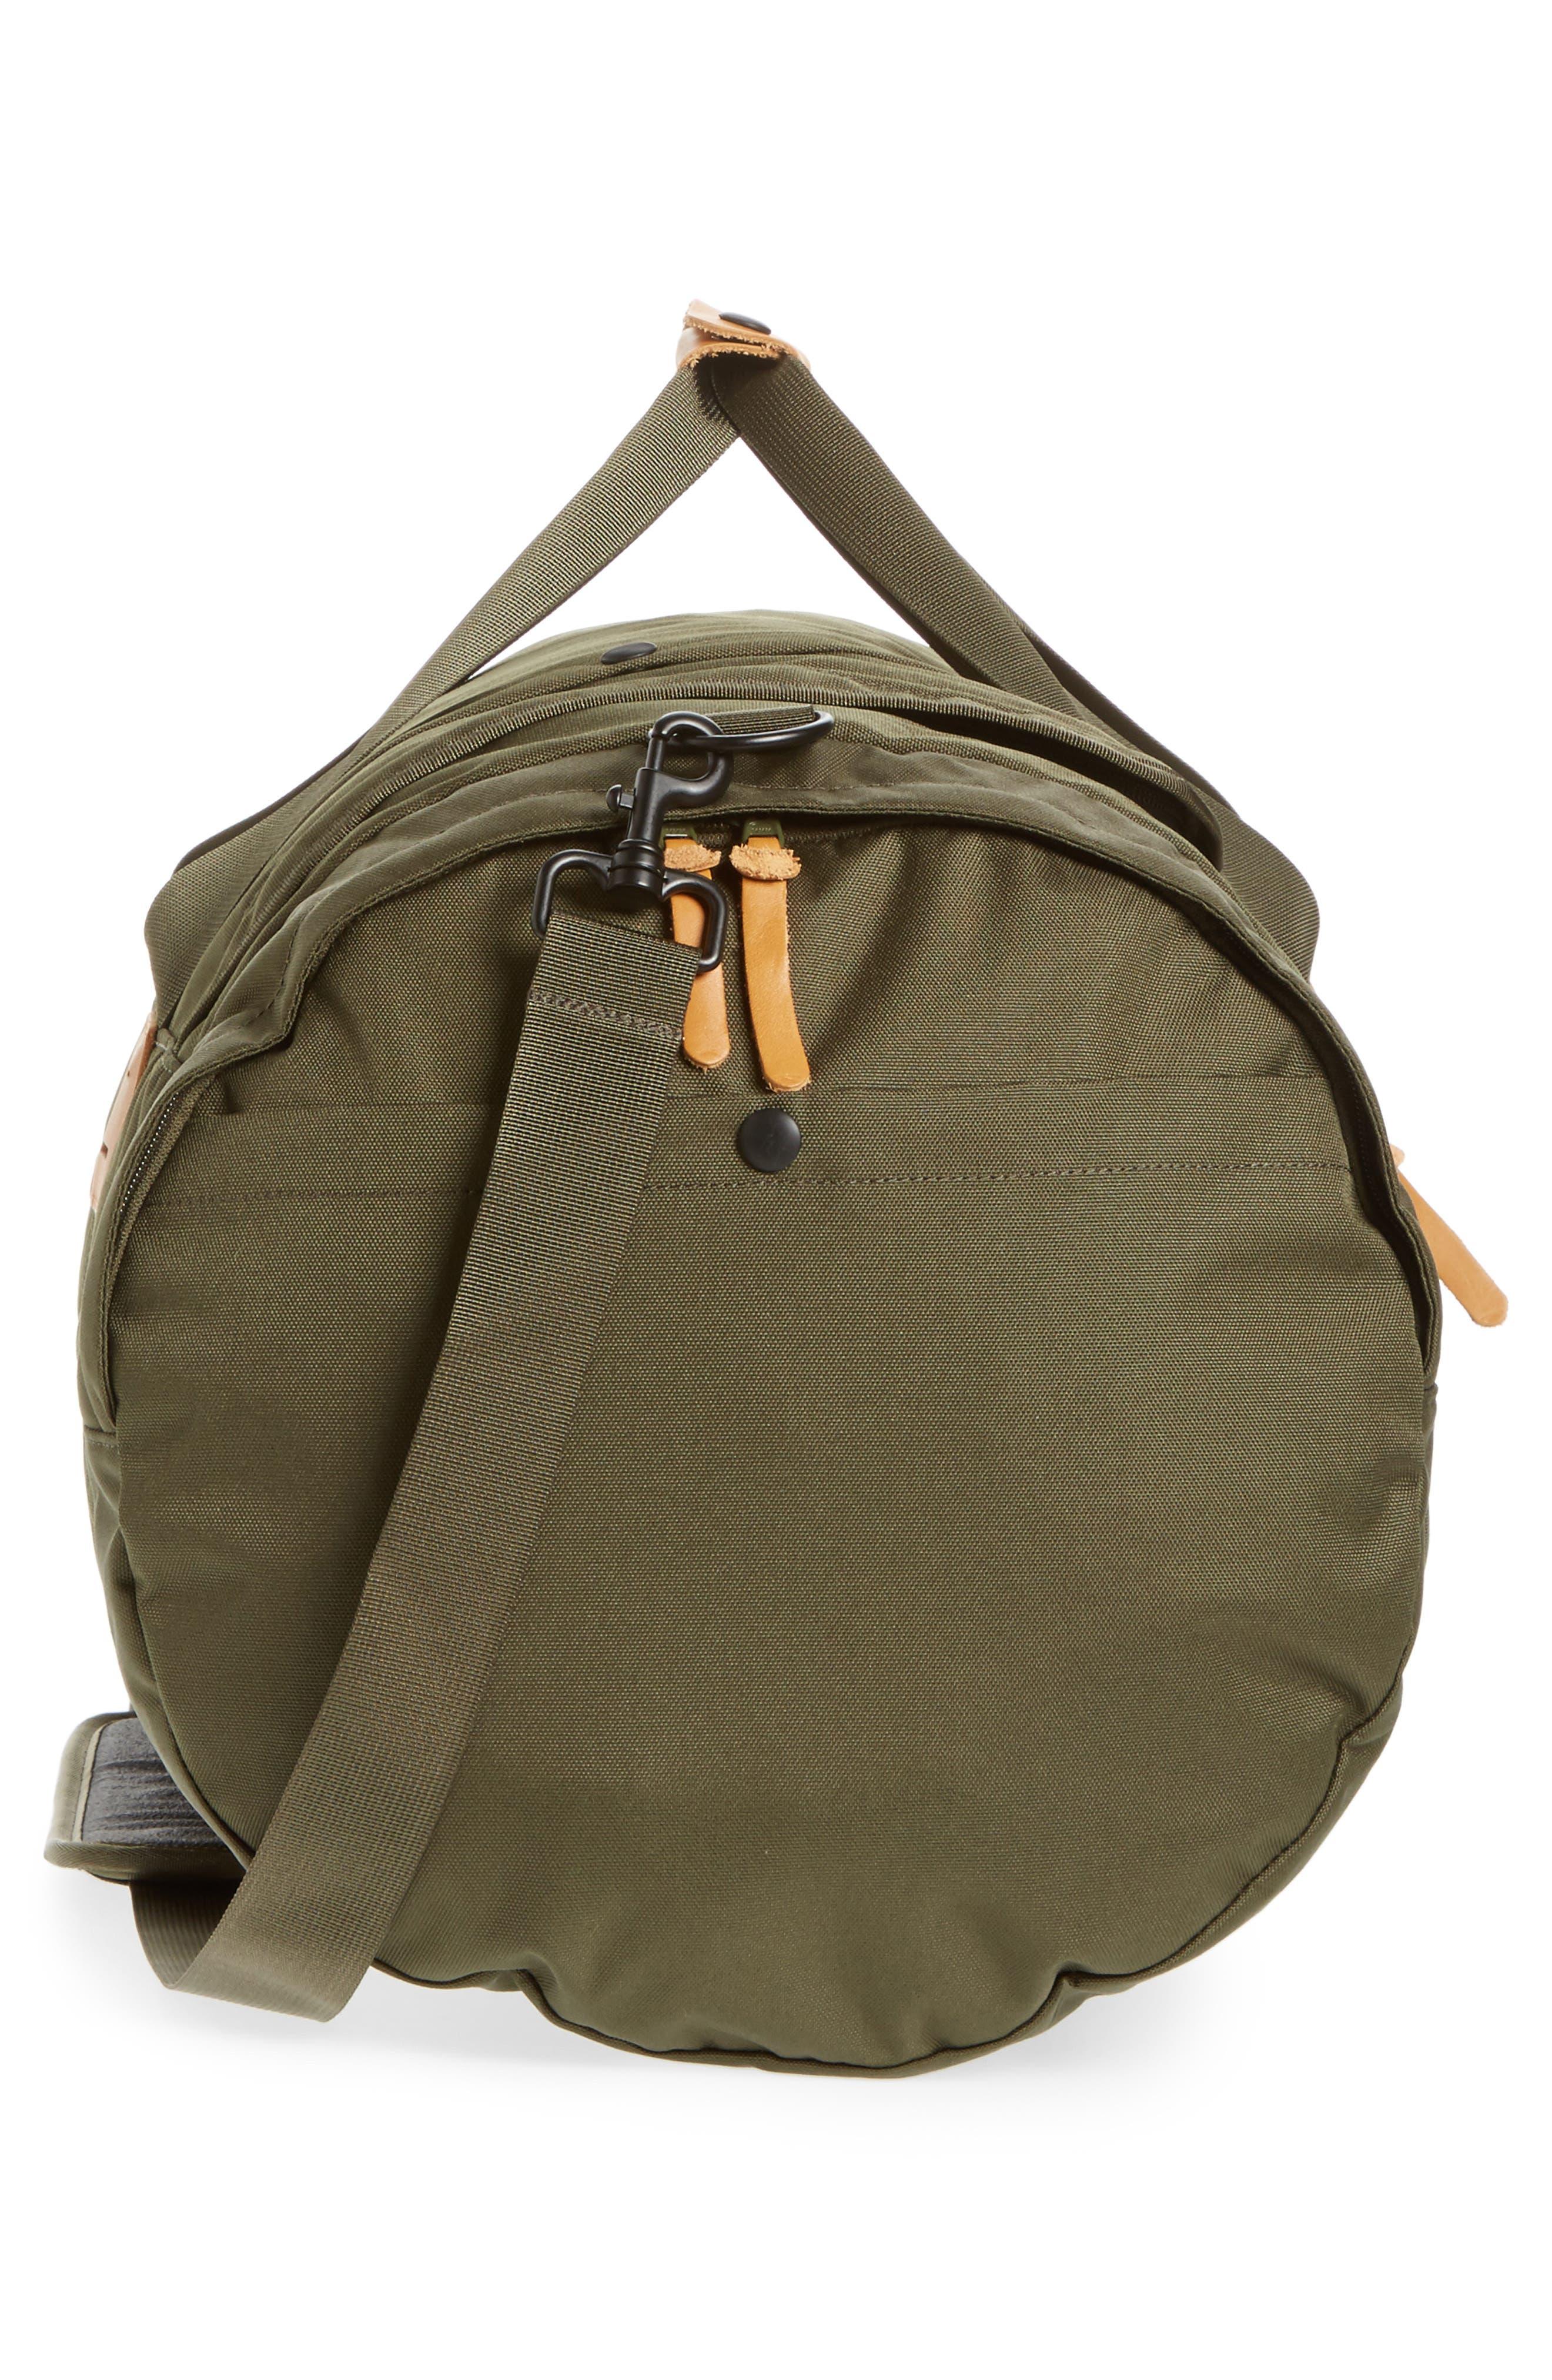 Arc Duffel Bag,                             Alternate thumbnail 5, color,                             Olive